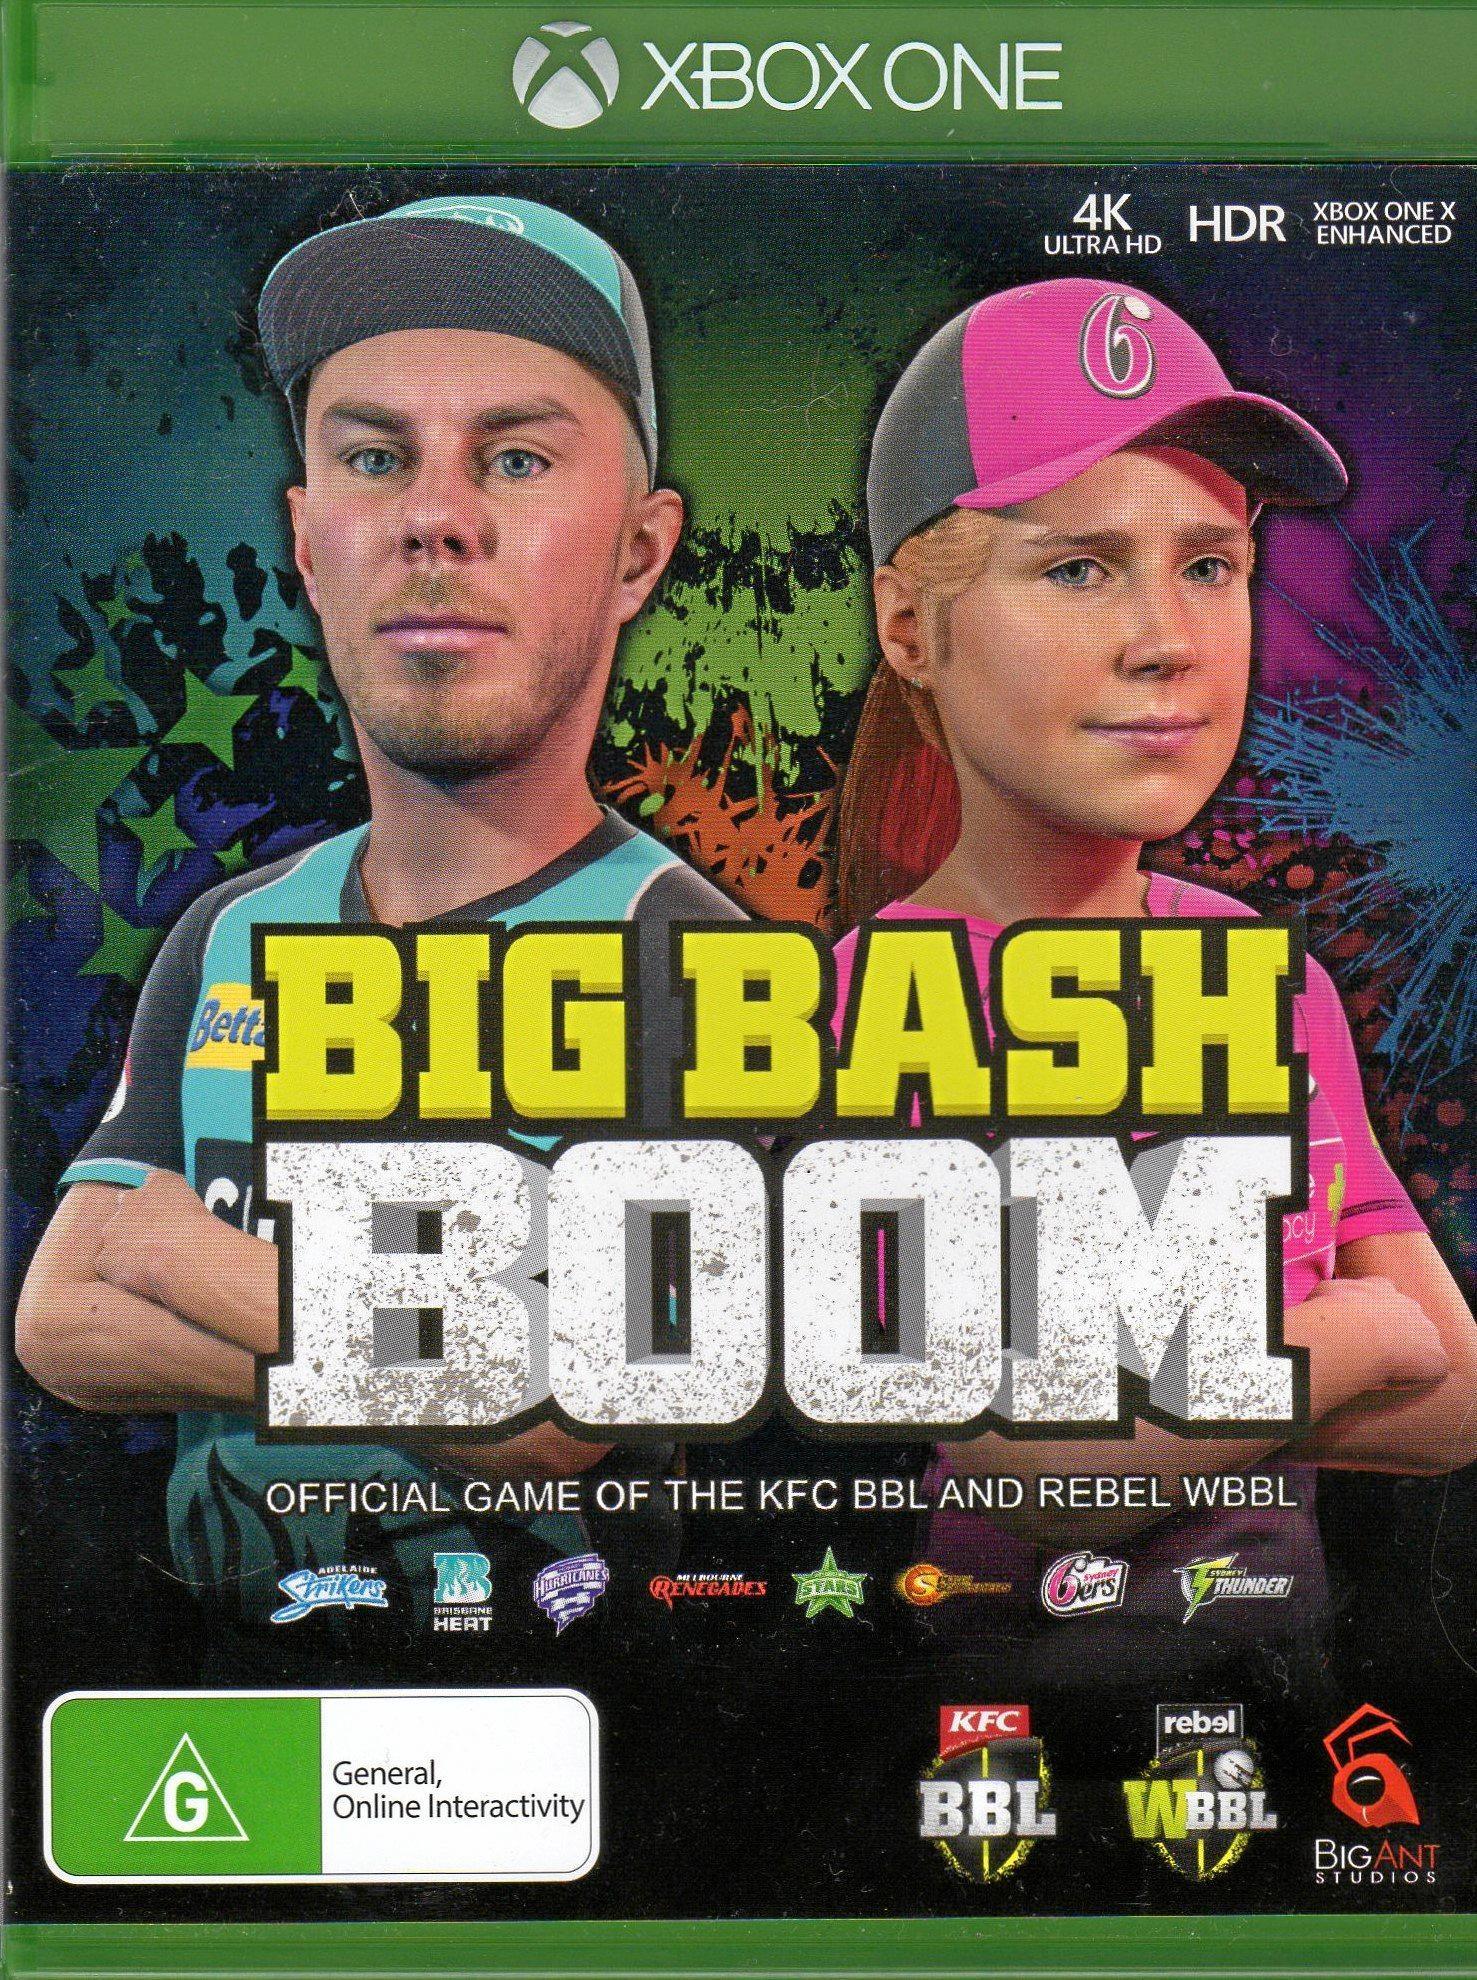 Cricket fans will enjoy the new arcade Twenty20 game.